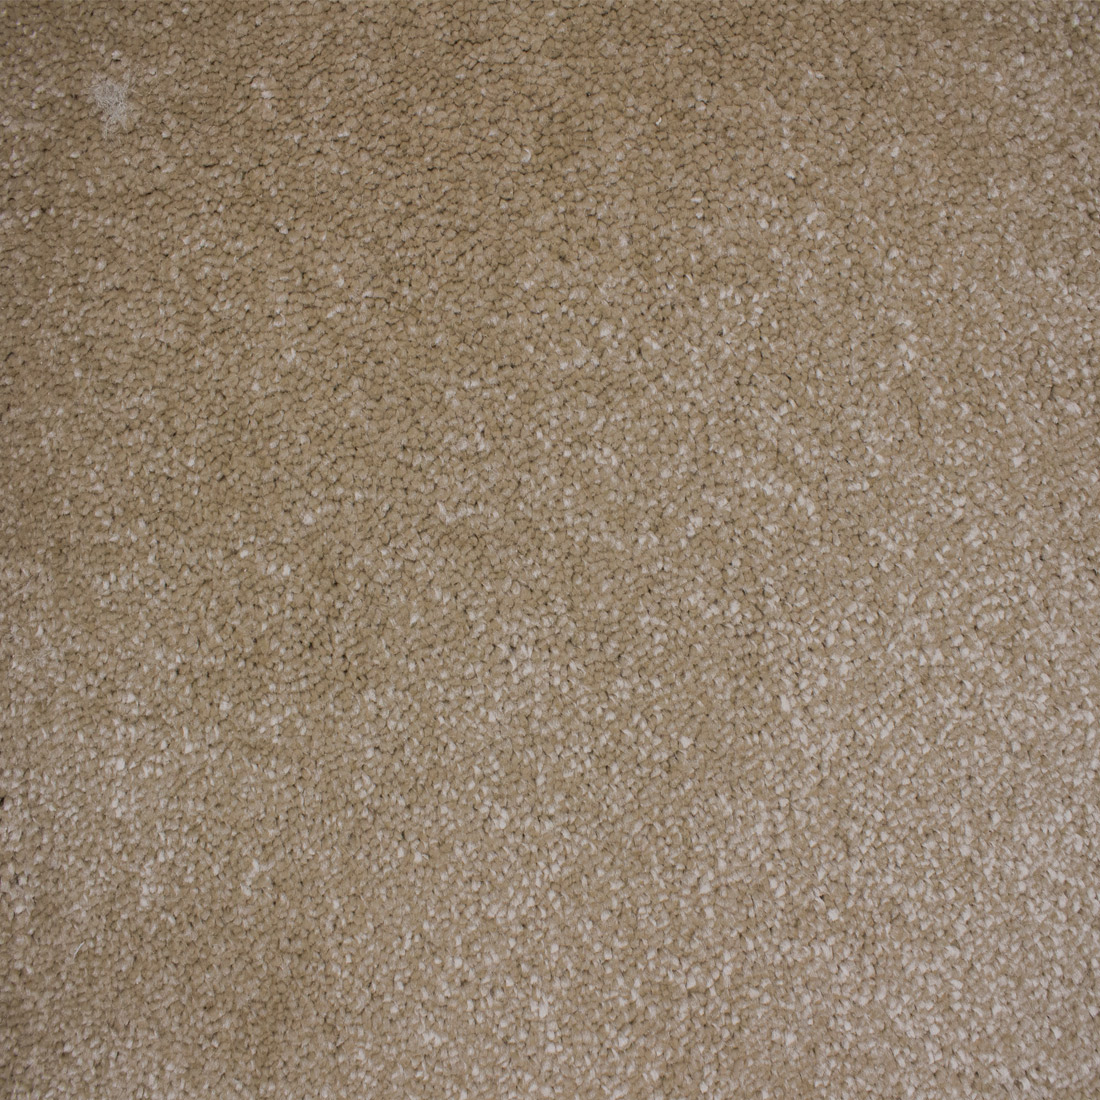 Vloerkleed Xilento Soft Sahara | 200 x 300 cm